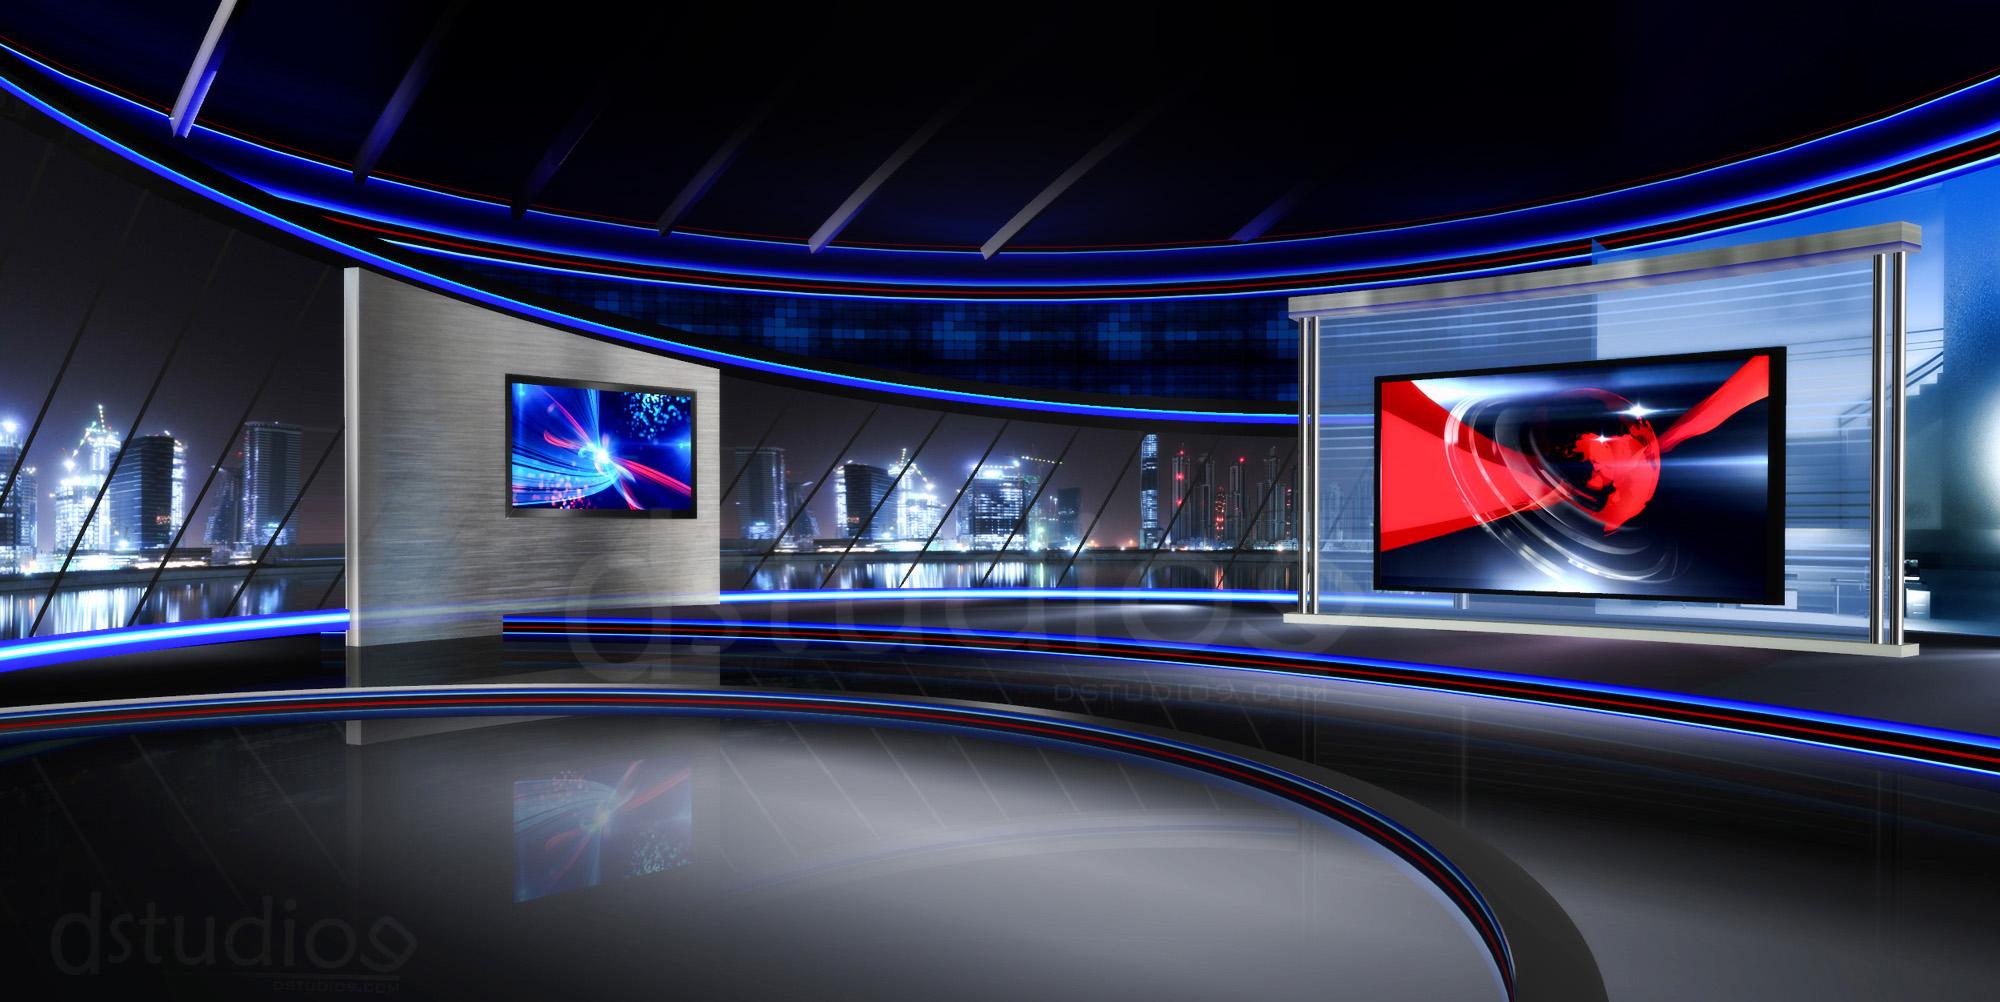 virtual studio after effects template tv studio ds9 4 free virtualset. Black Bedroom Furniture Sets. Home Design Ideas